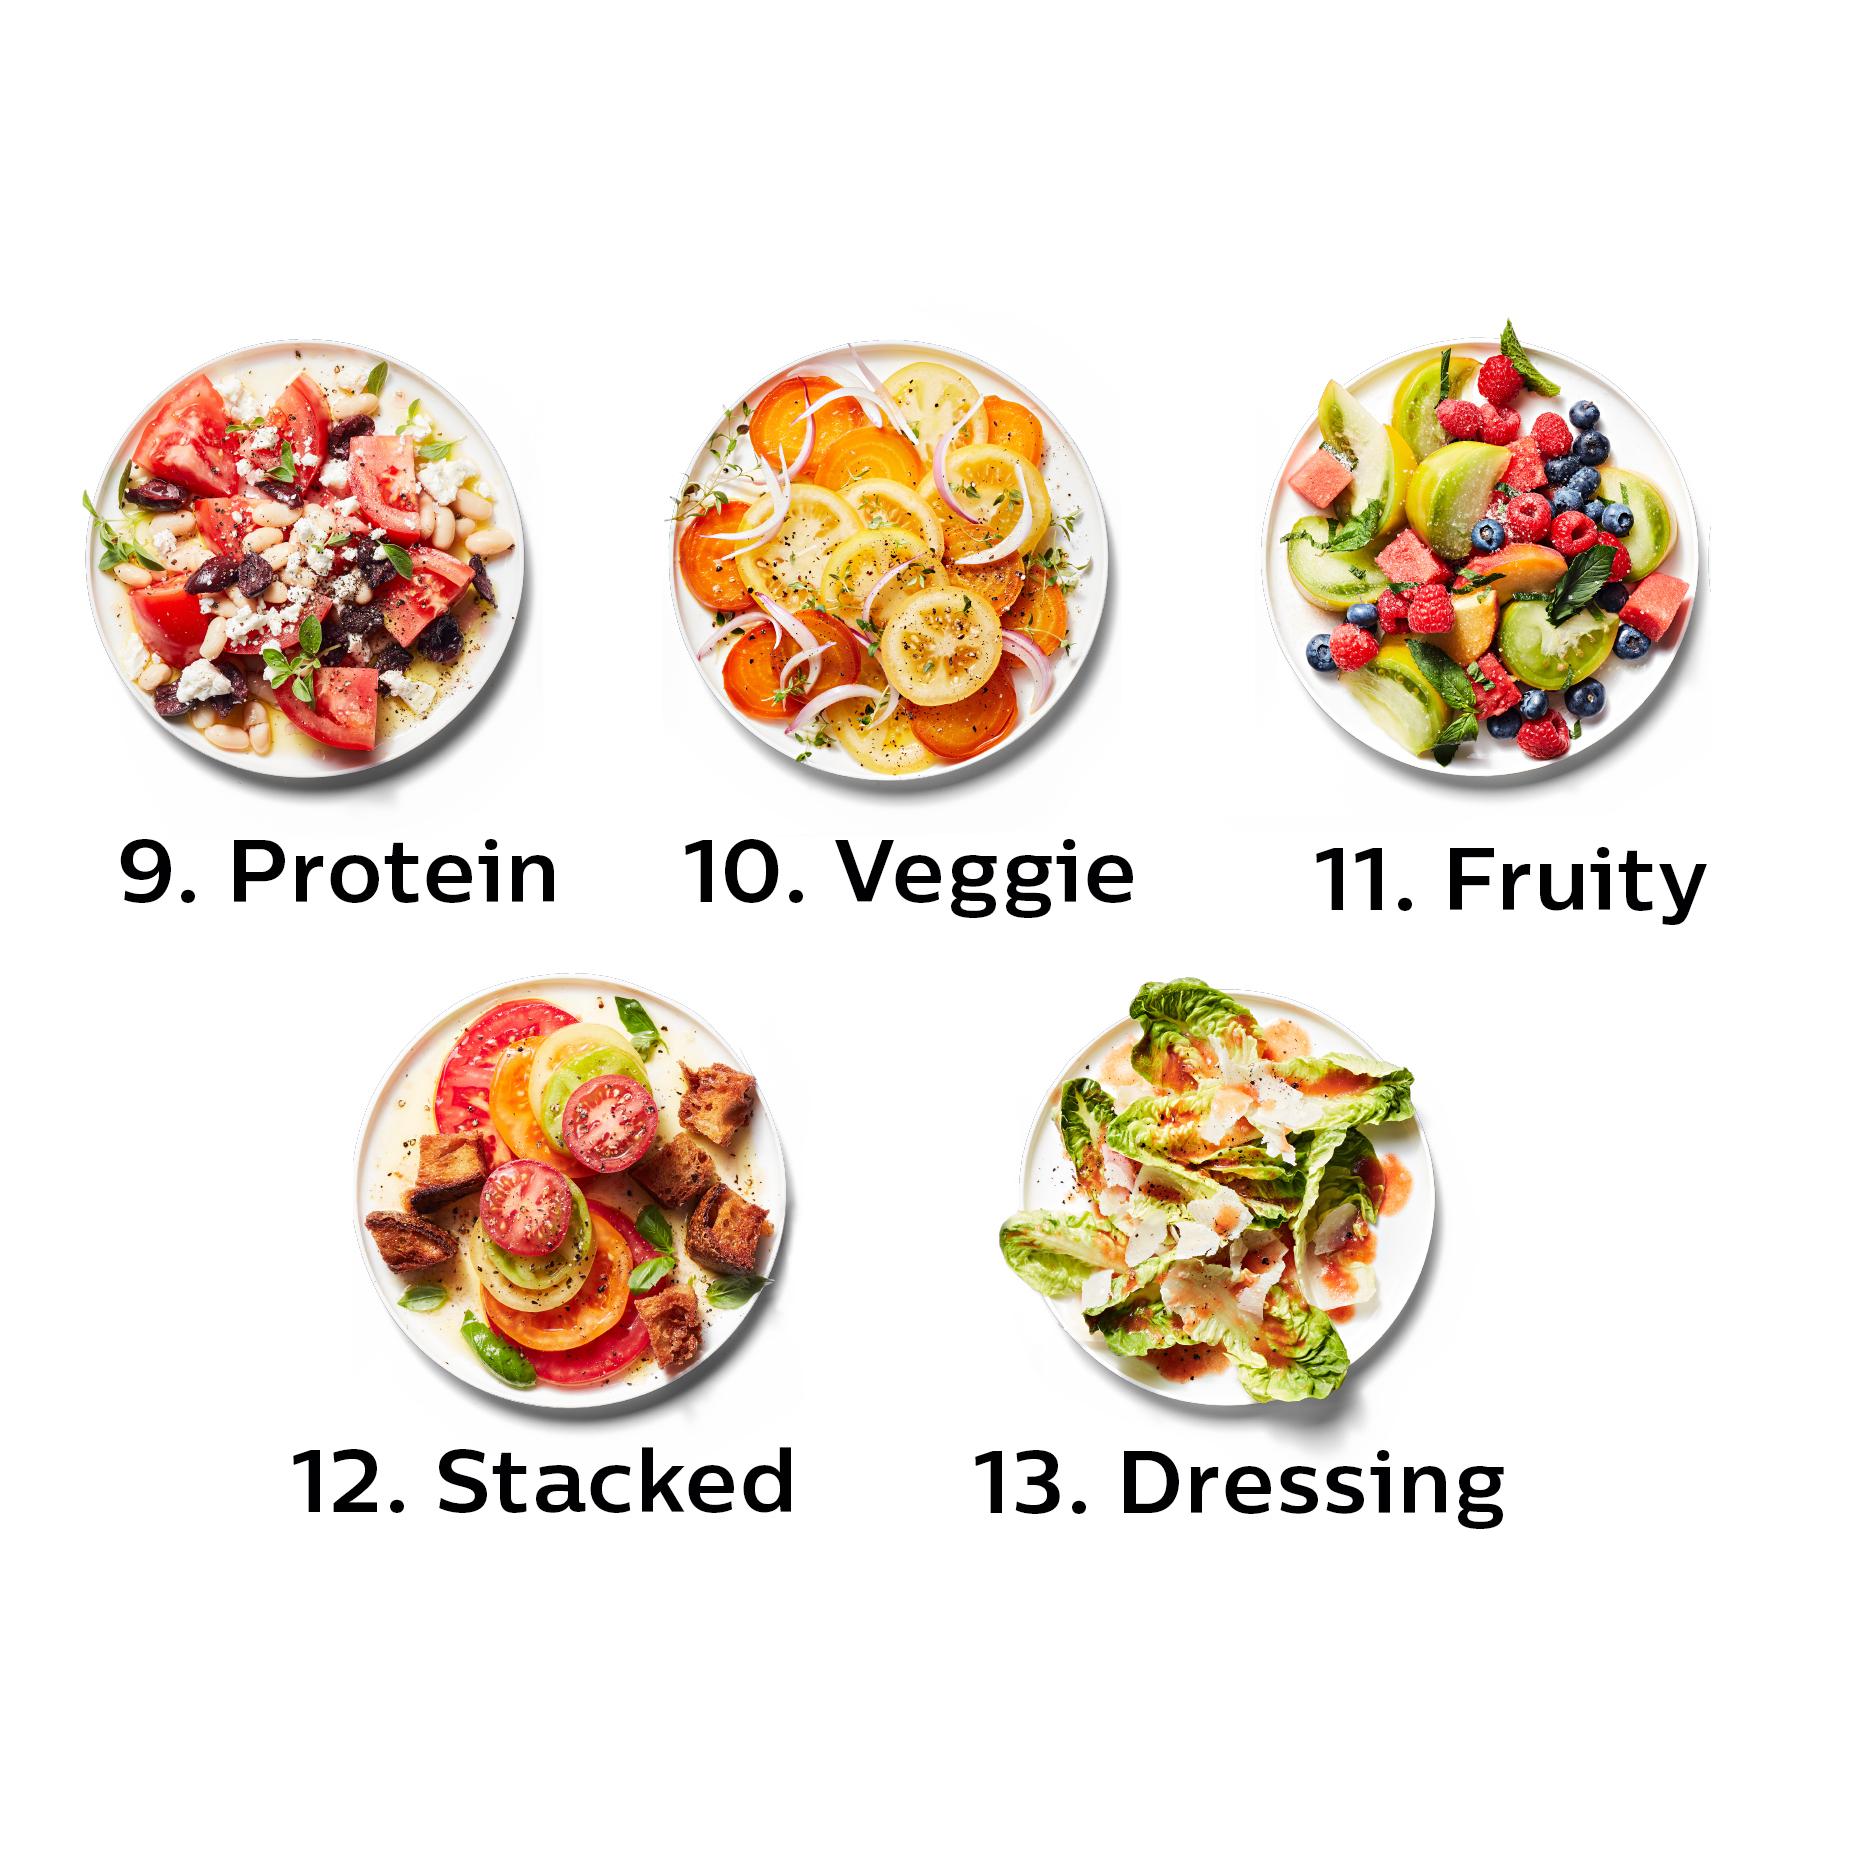 tomato salad pizza varieties